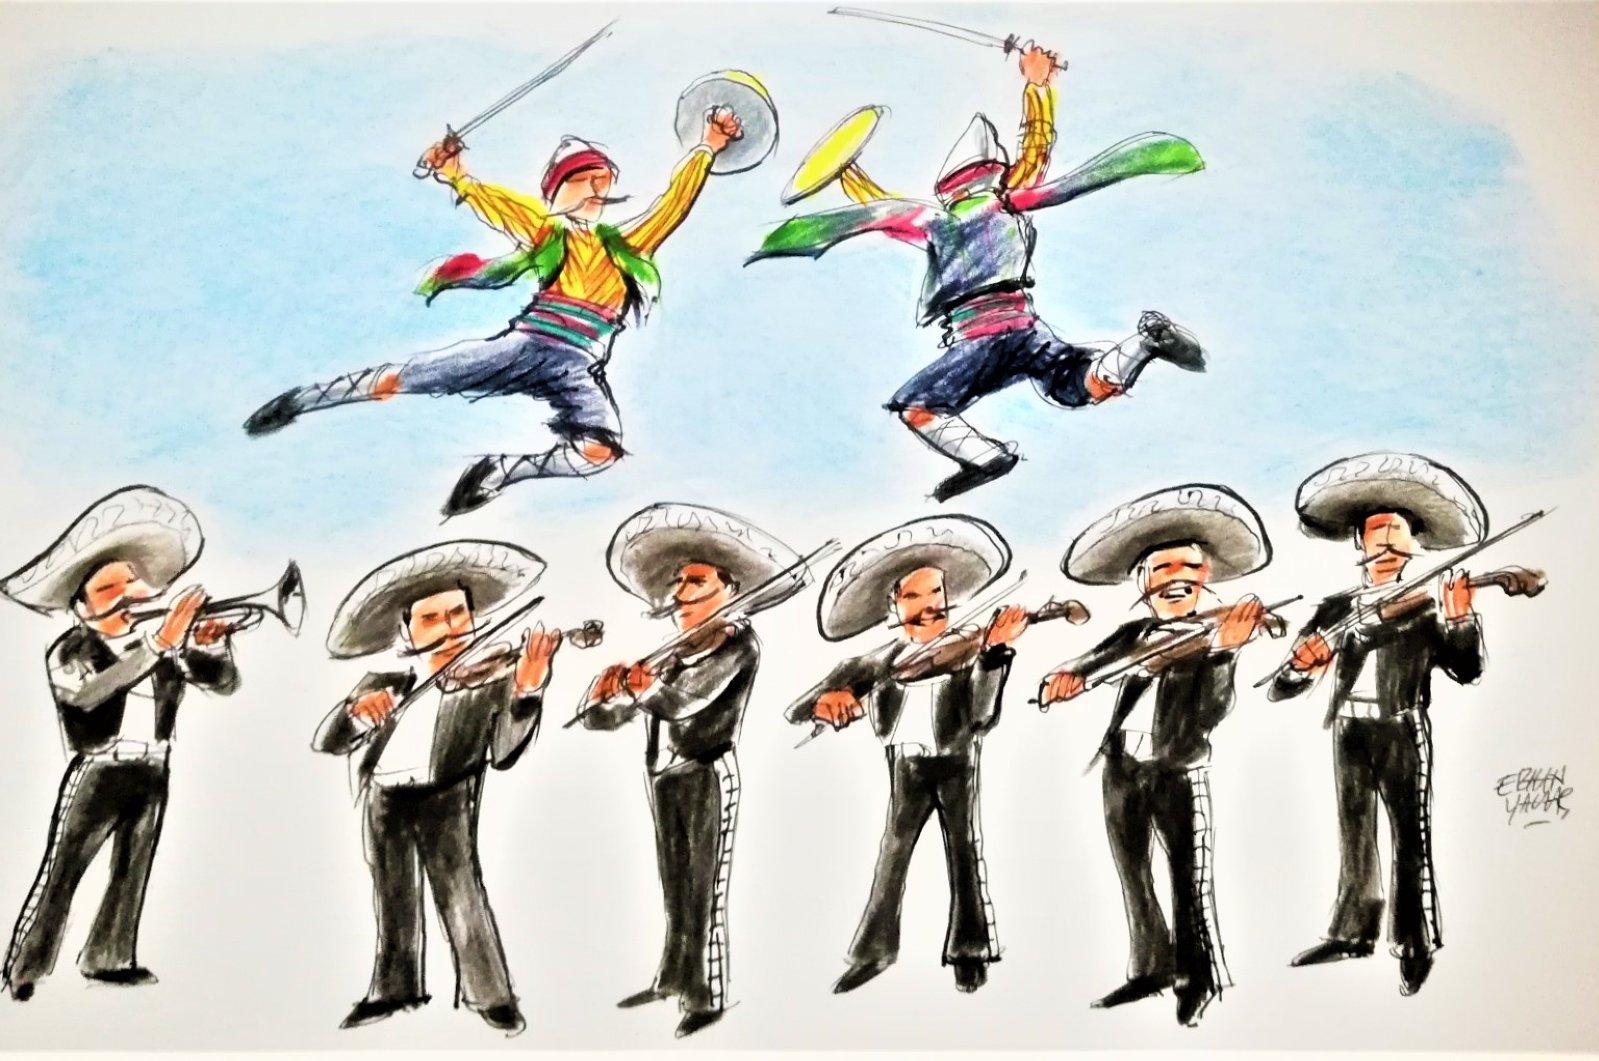 Mexico's (dis)similarities with Turkey   Daily Sabah - Daily Sabah